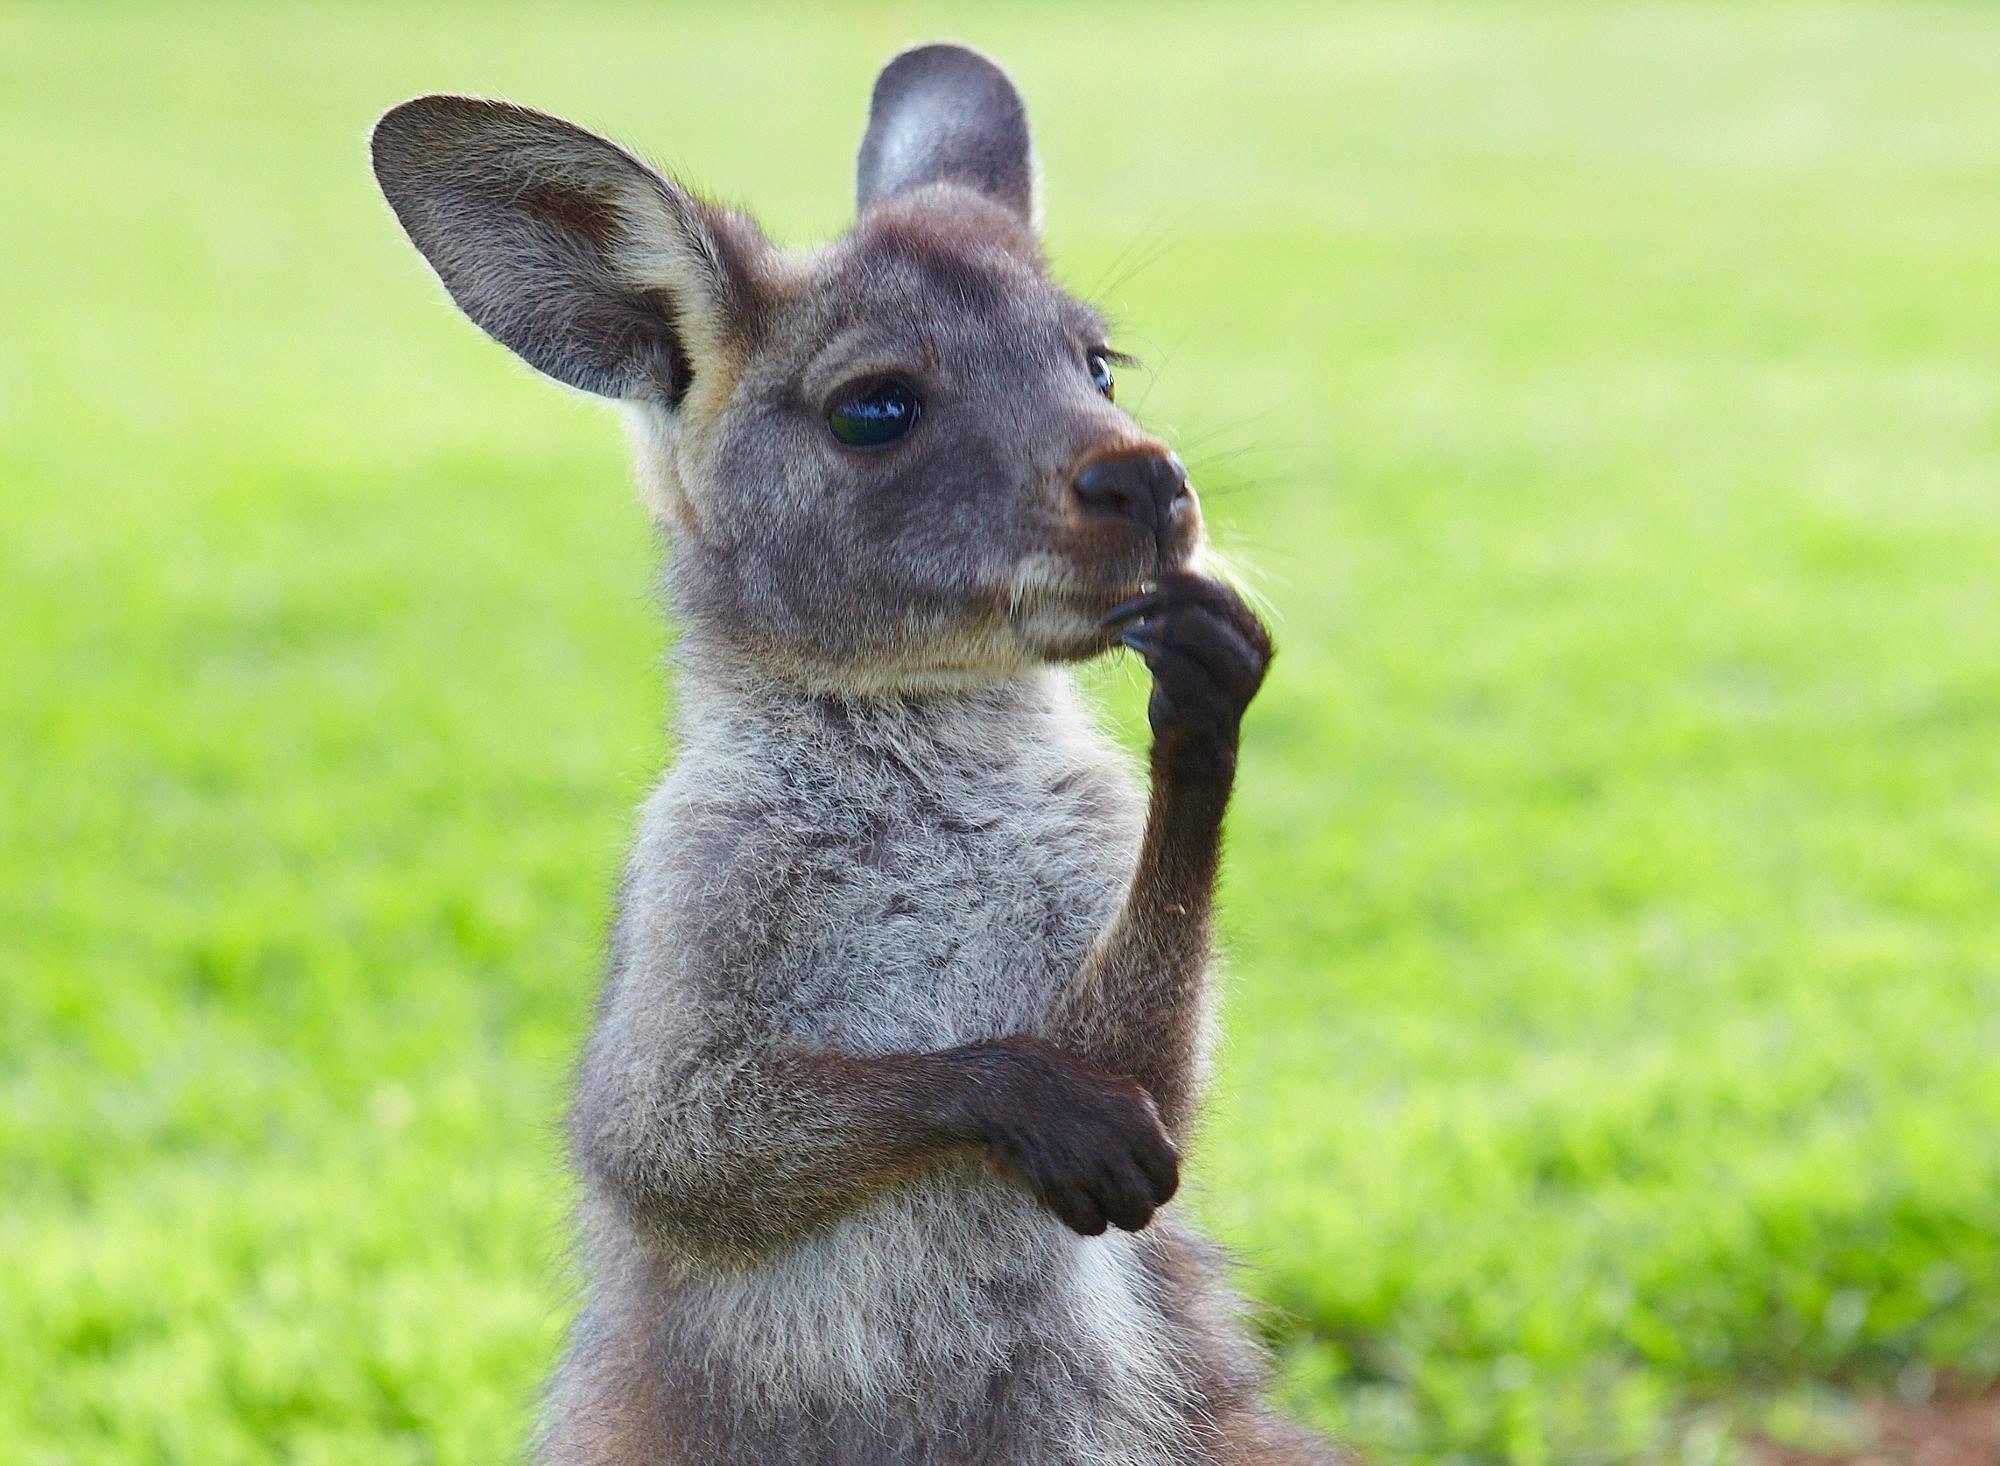 Thinking kangaroo Funny animals, Cute animals